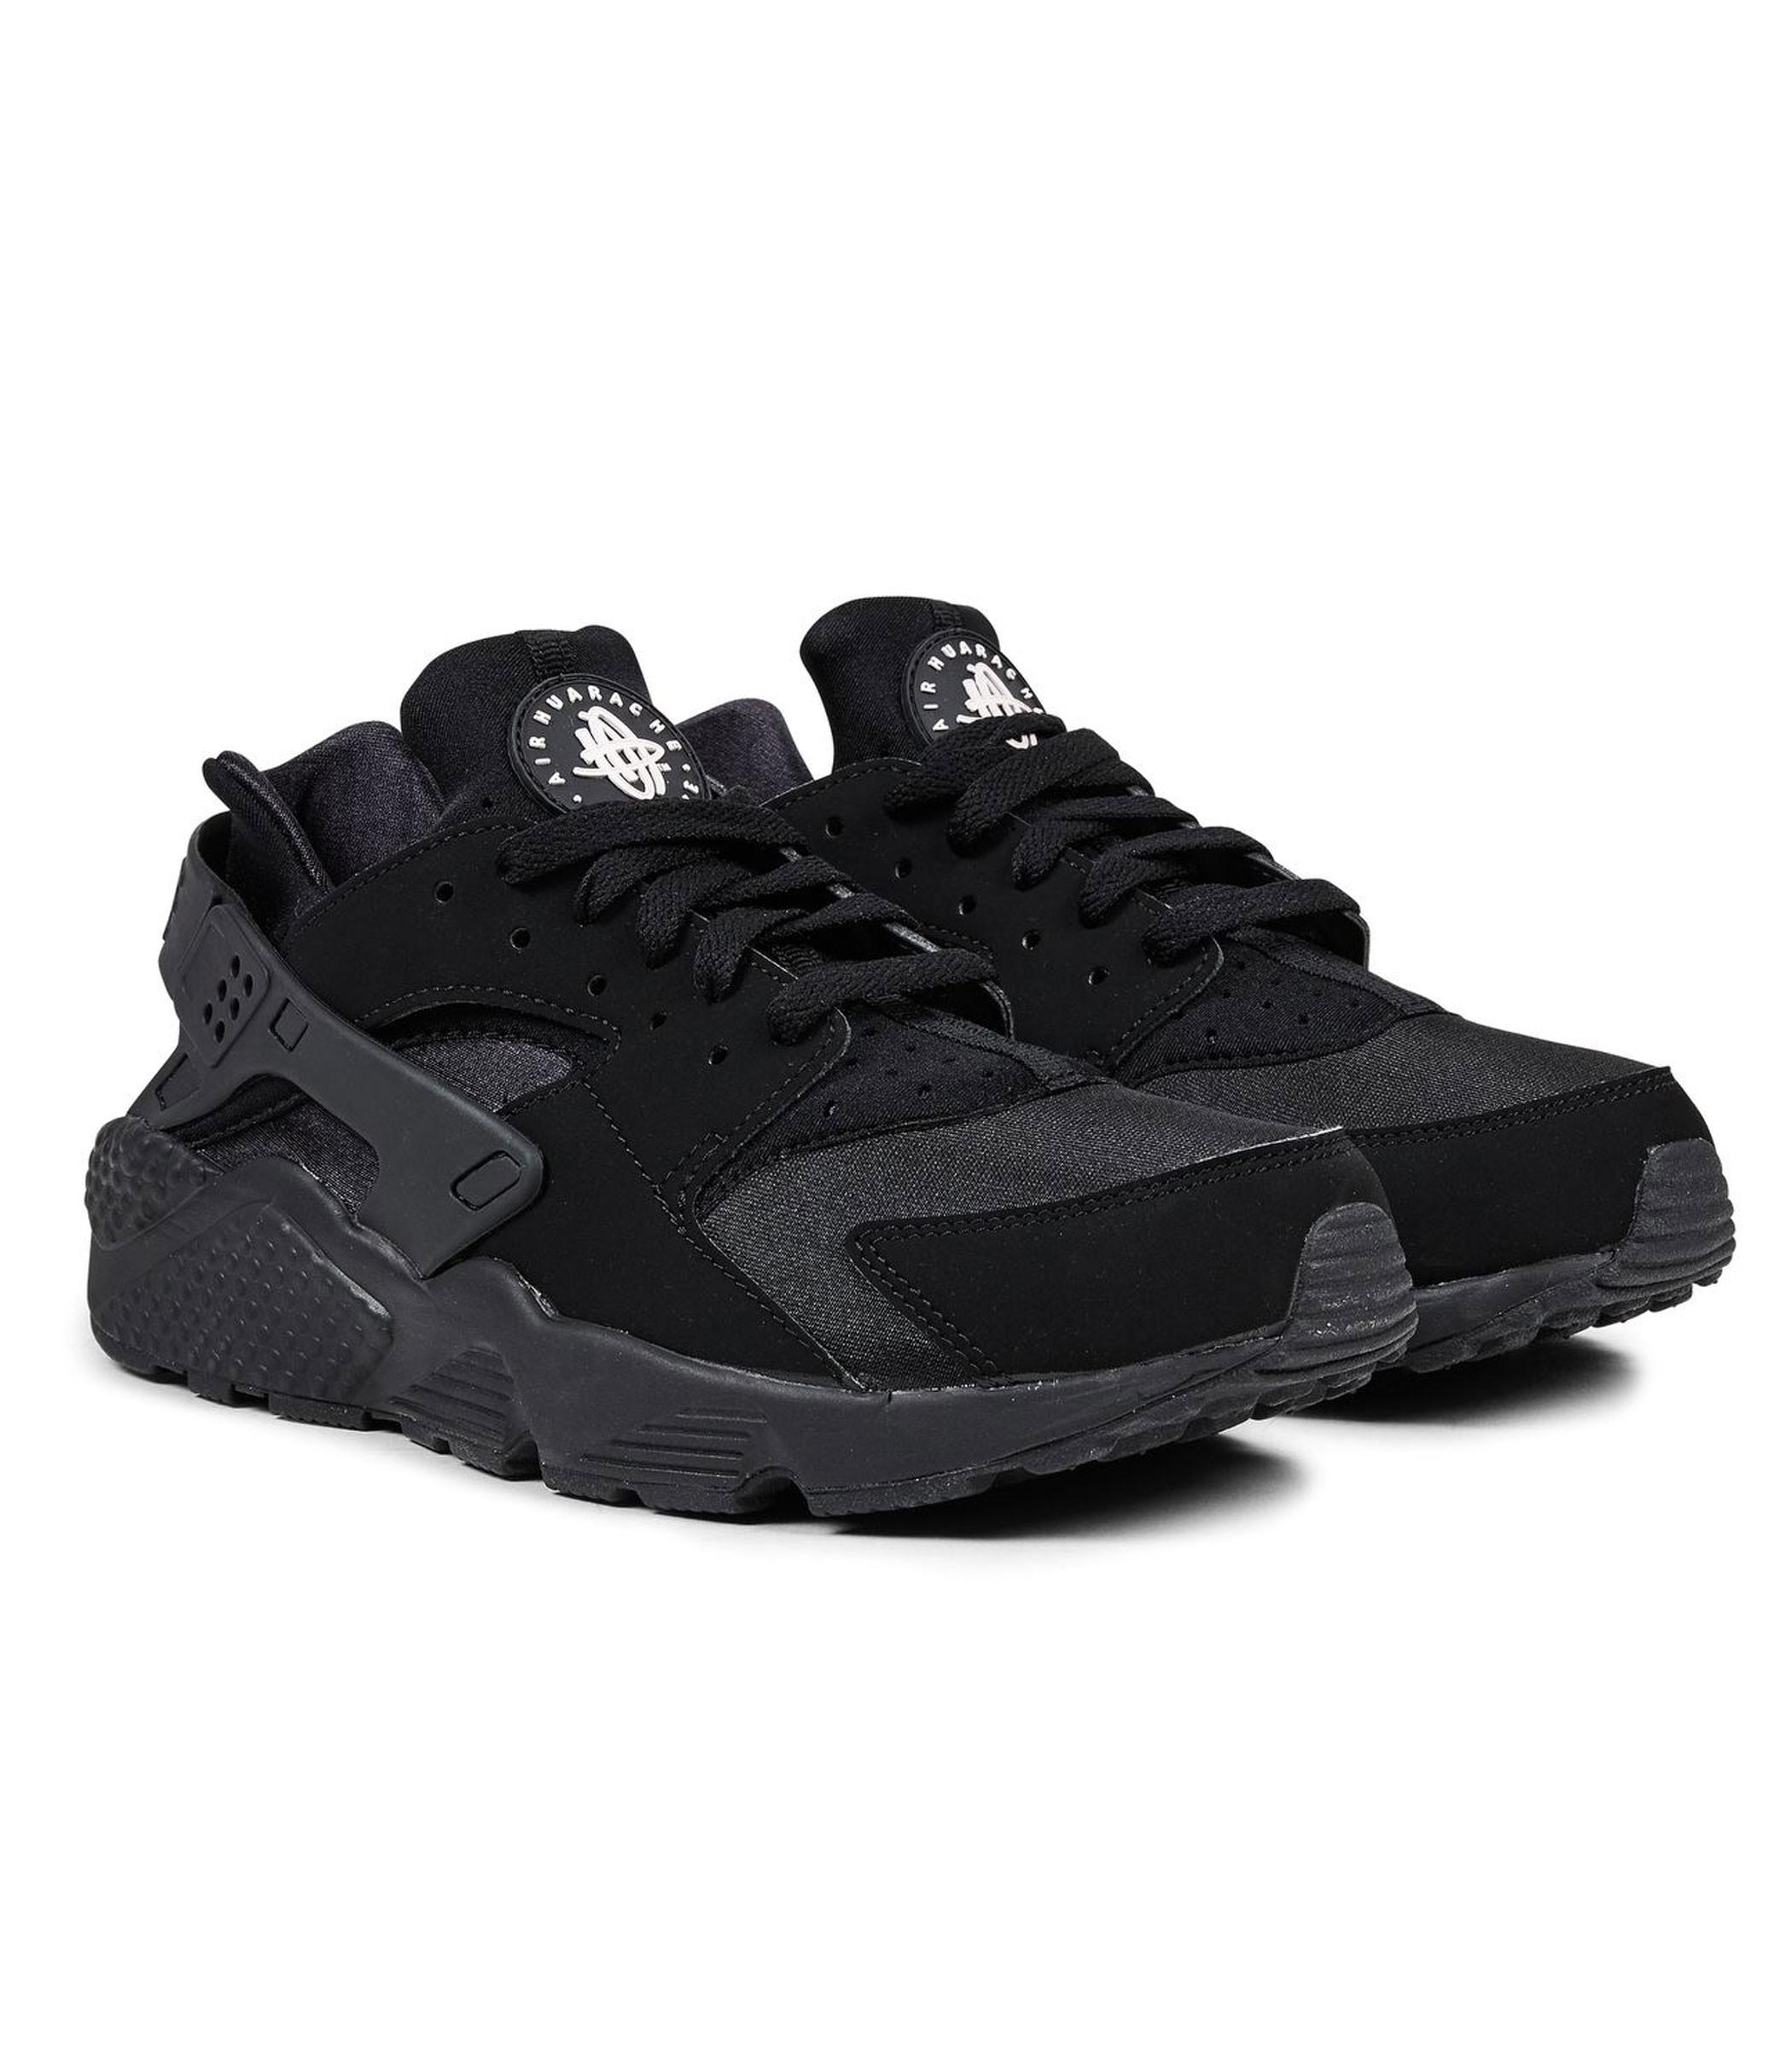 online store 86b9d 8fef6 Scarpe Sneakers Nike Air Huarache da Uomo Rif. 318429-003